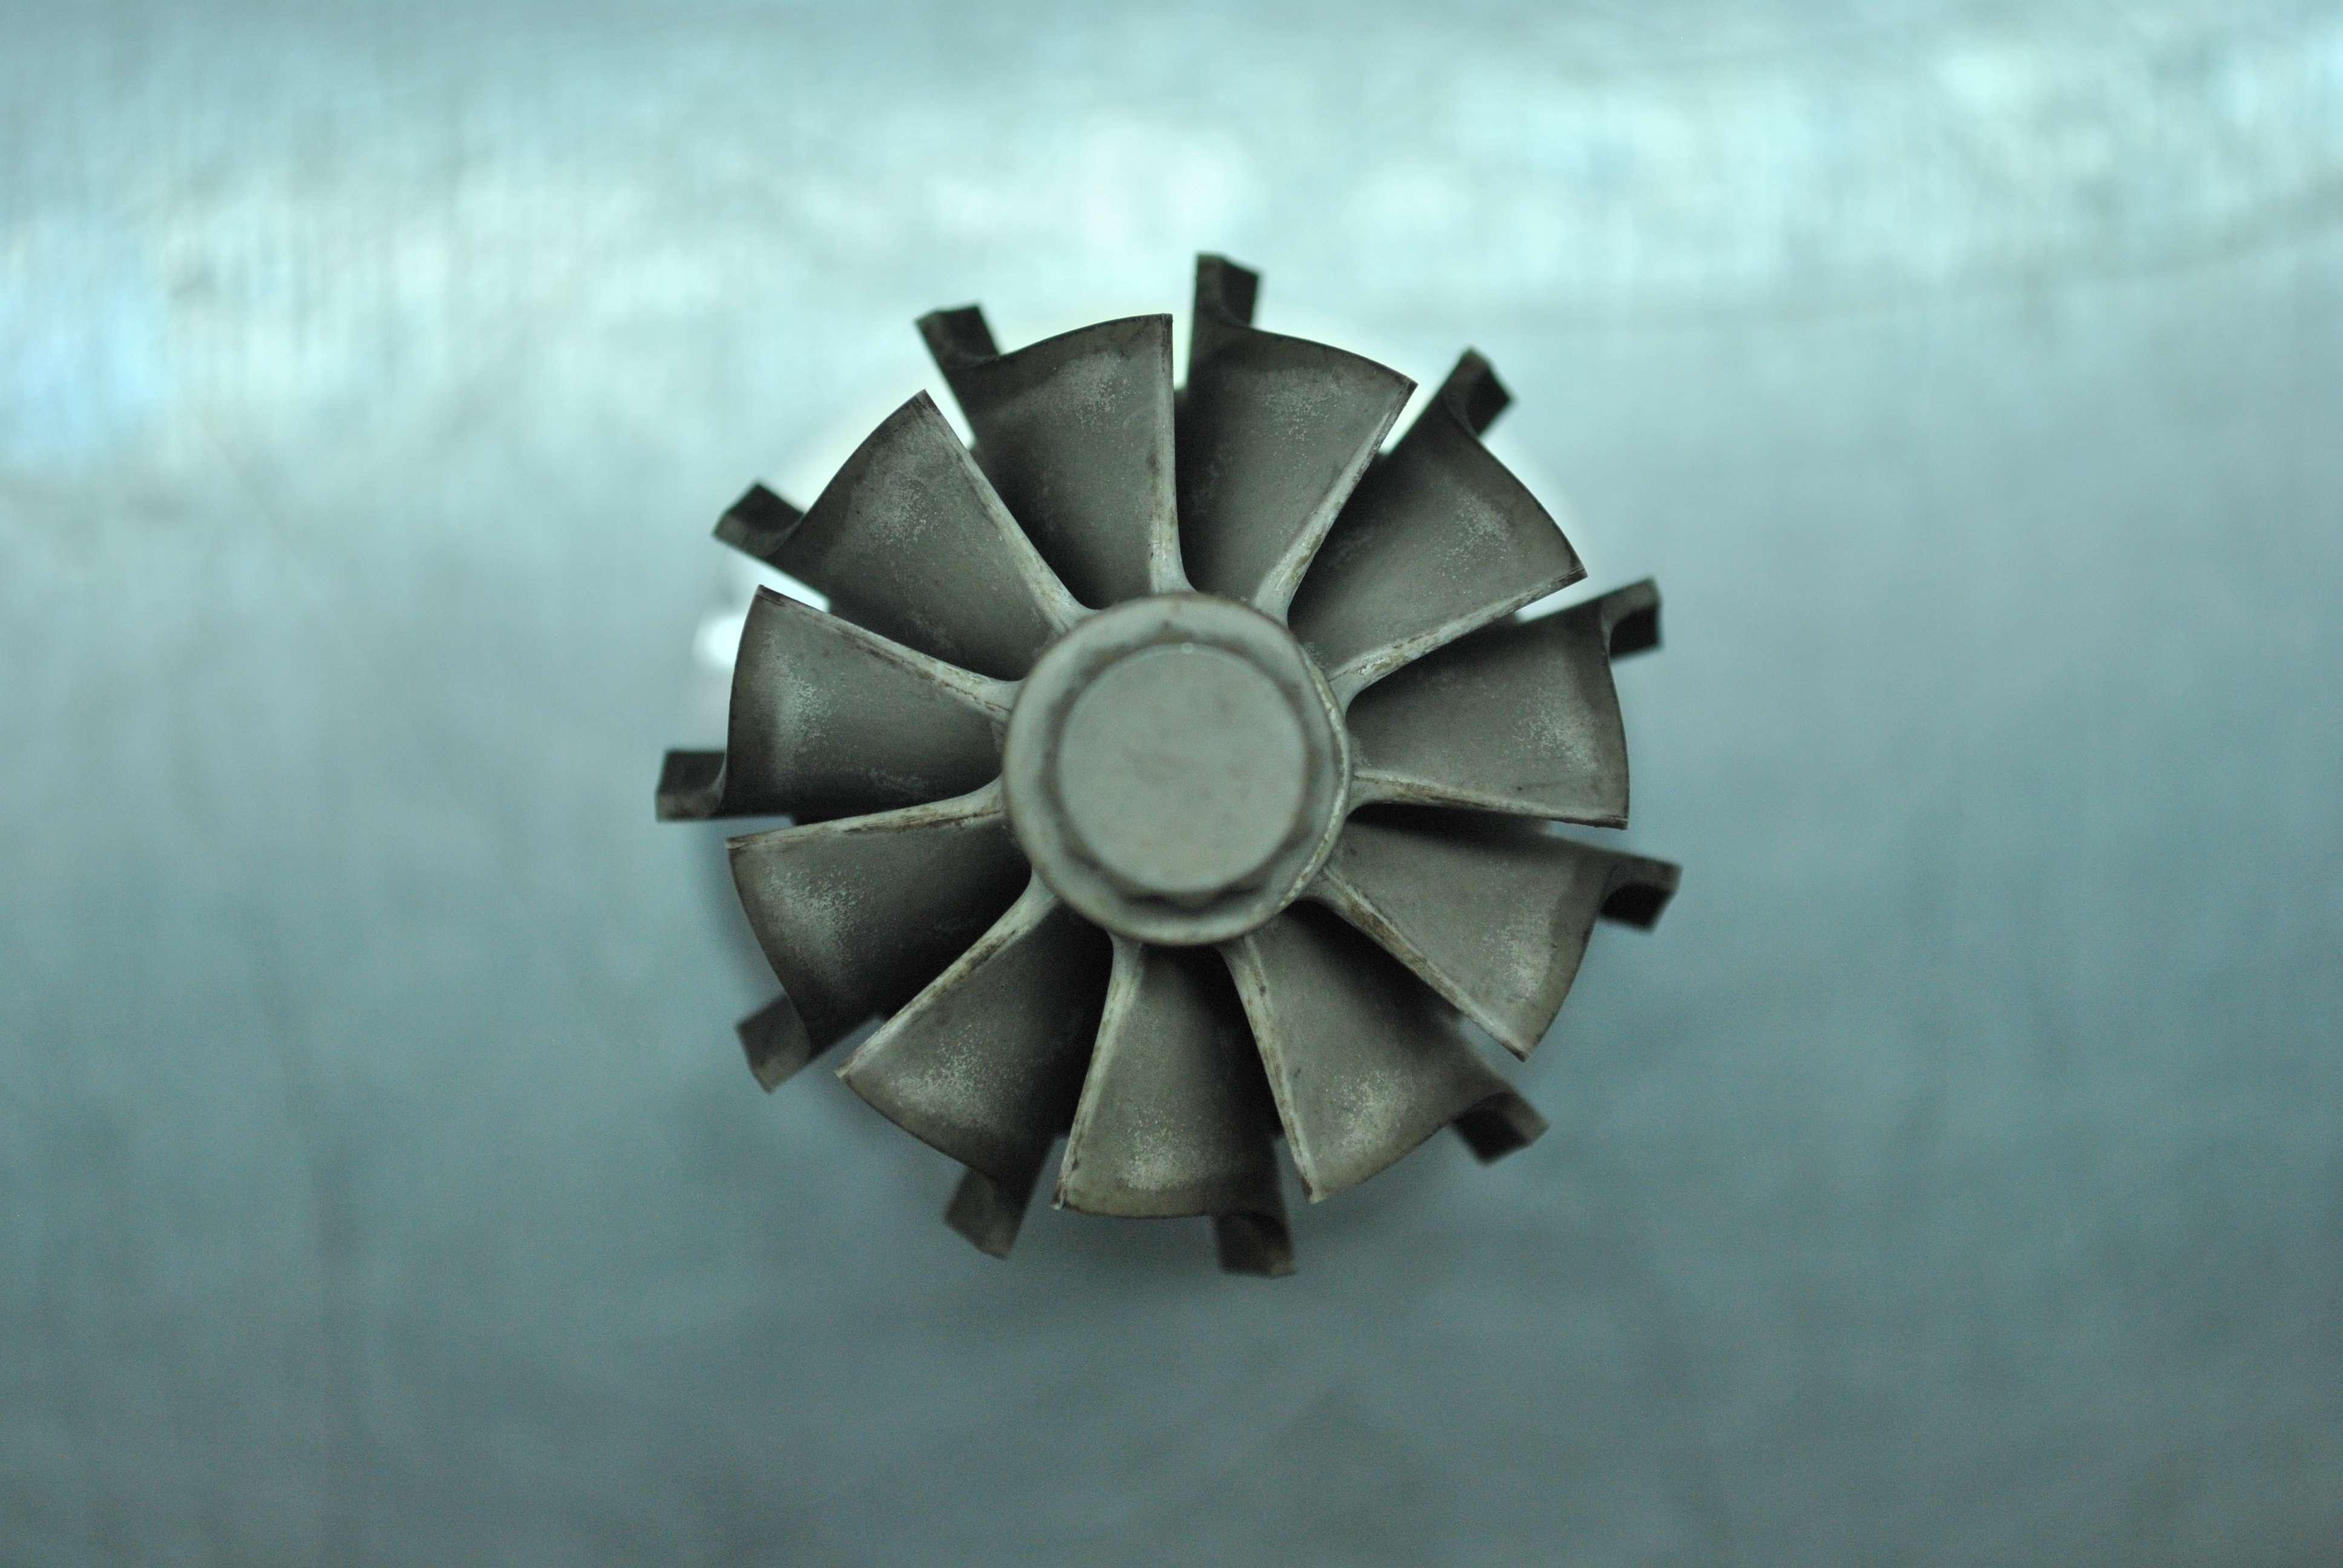 RB26 GTR Vspec Turbos SKYLINE R33 (update Ceramic exhaust